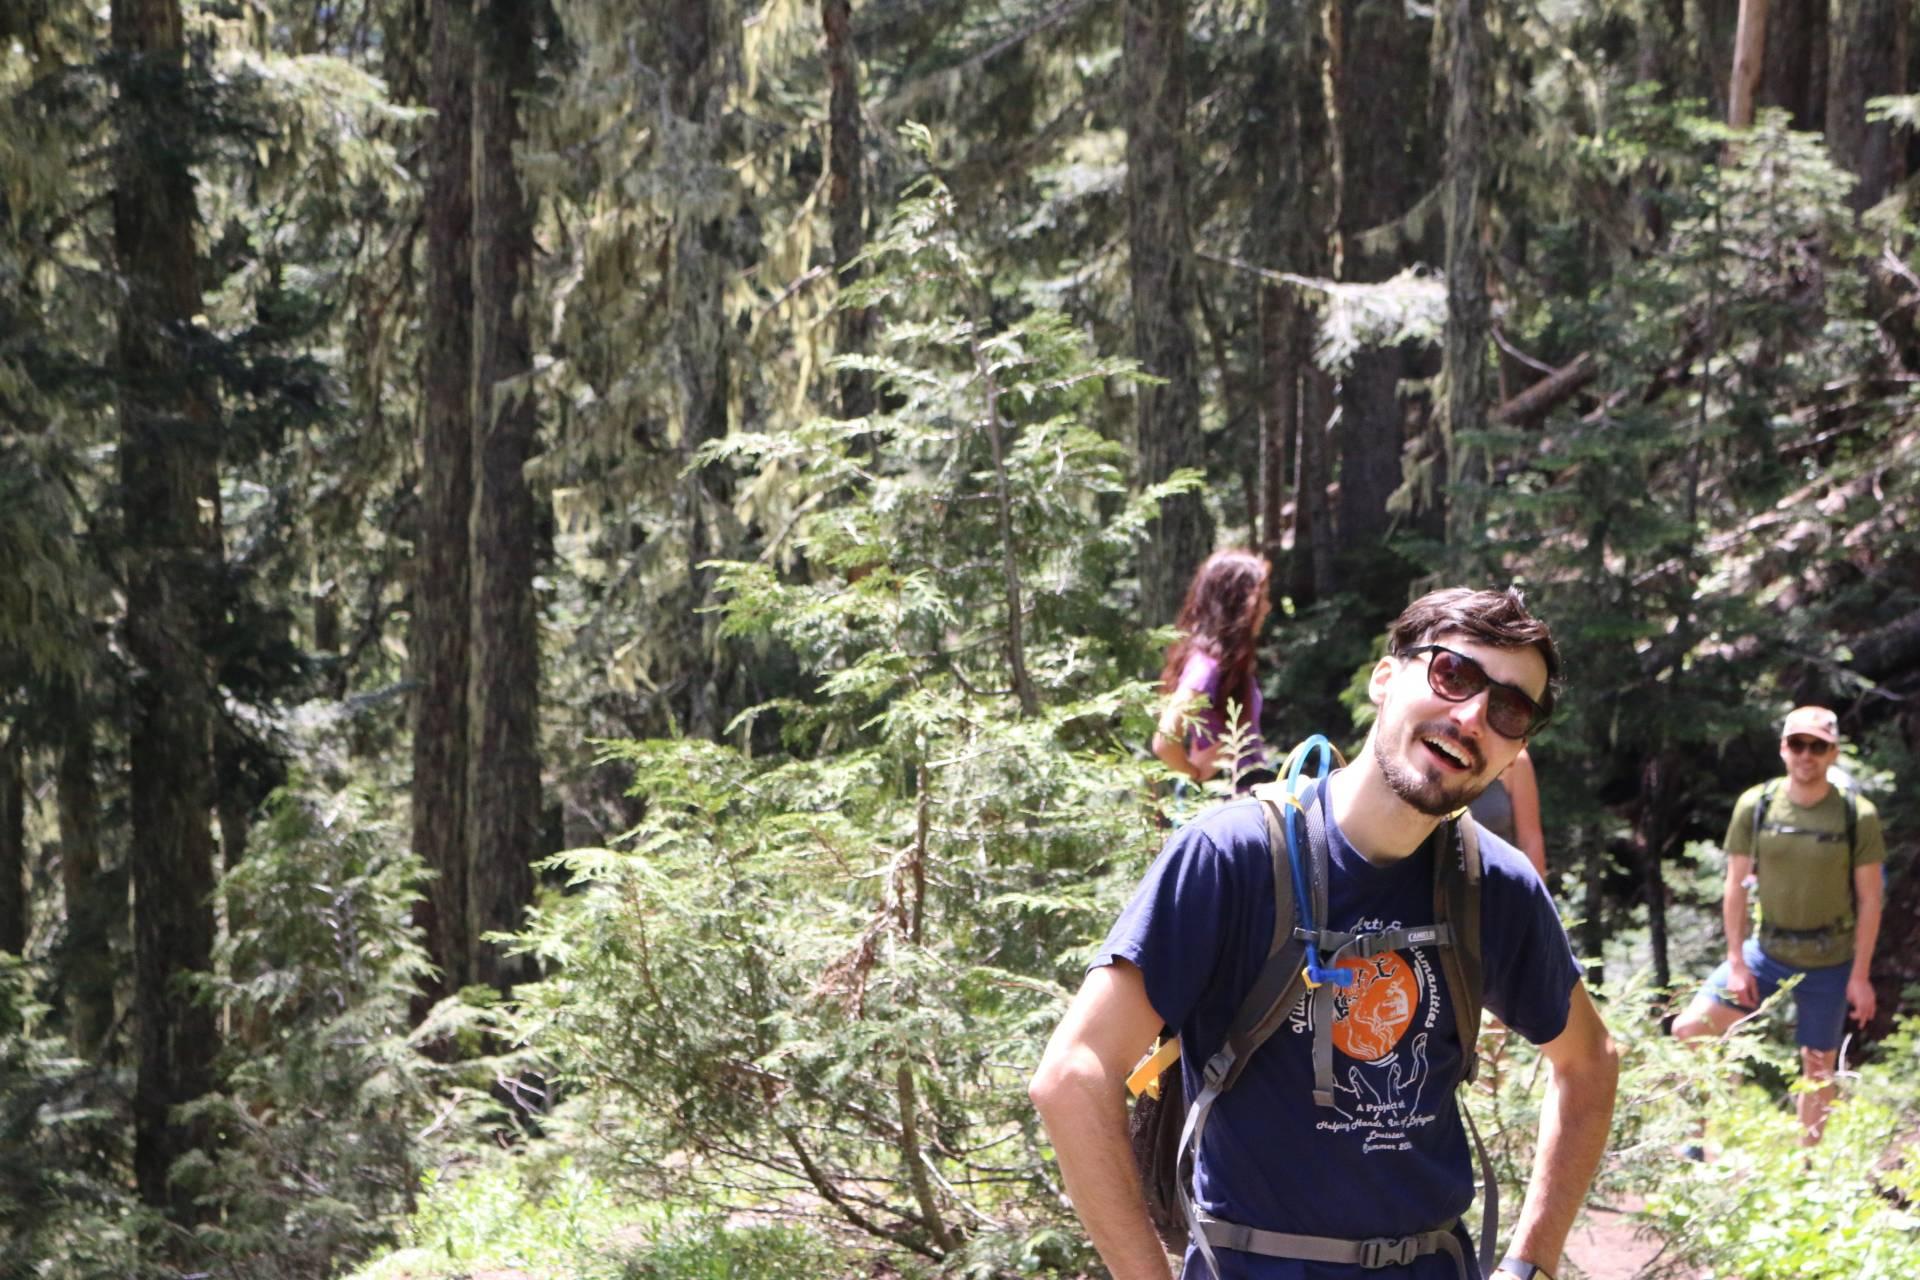 Hiking to High Rock Lookout Hike, Mt. Rainer WA